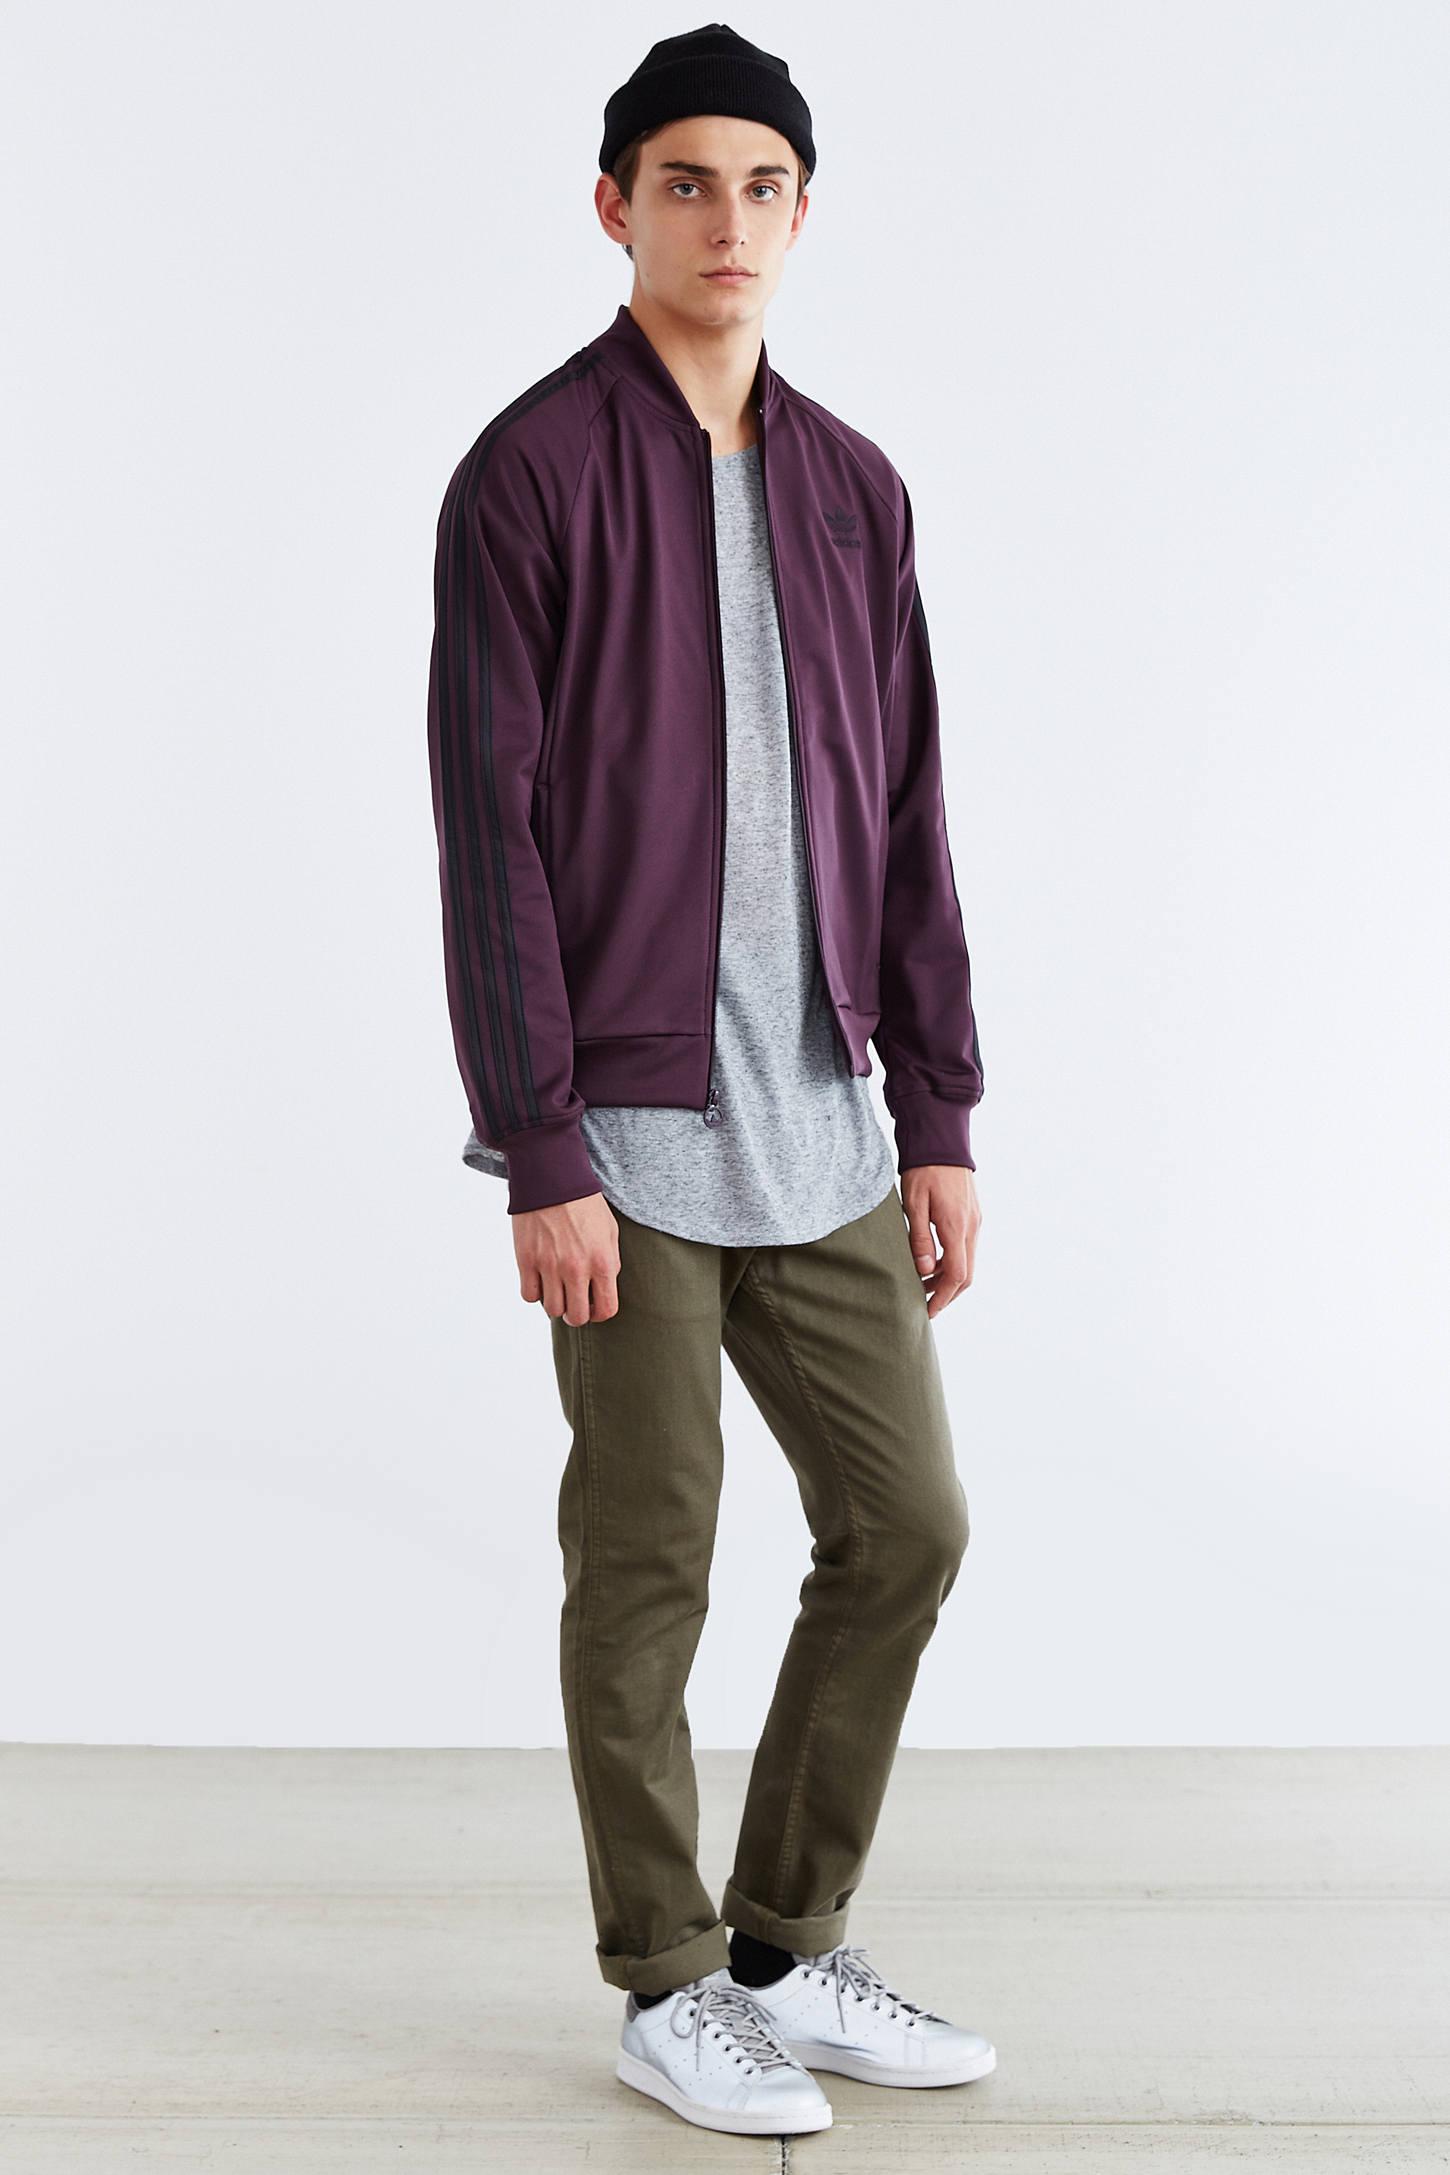 Adidas Superstar Giacca Urban Outfitters Originali Tracce Originali Outfitters e3f55d